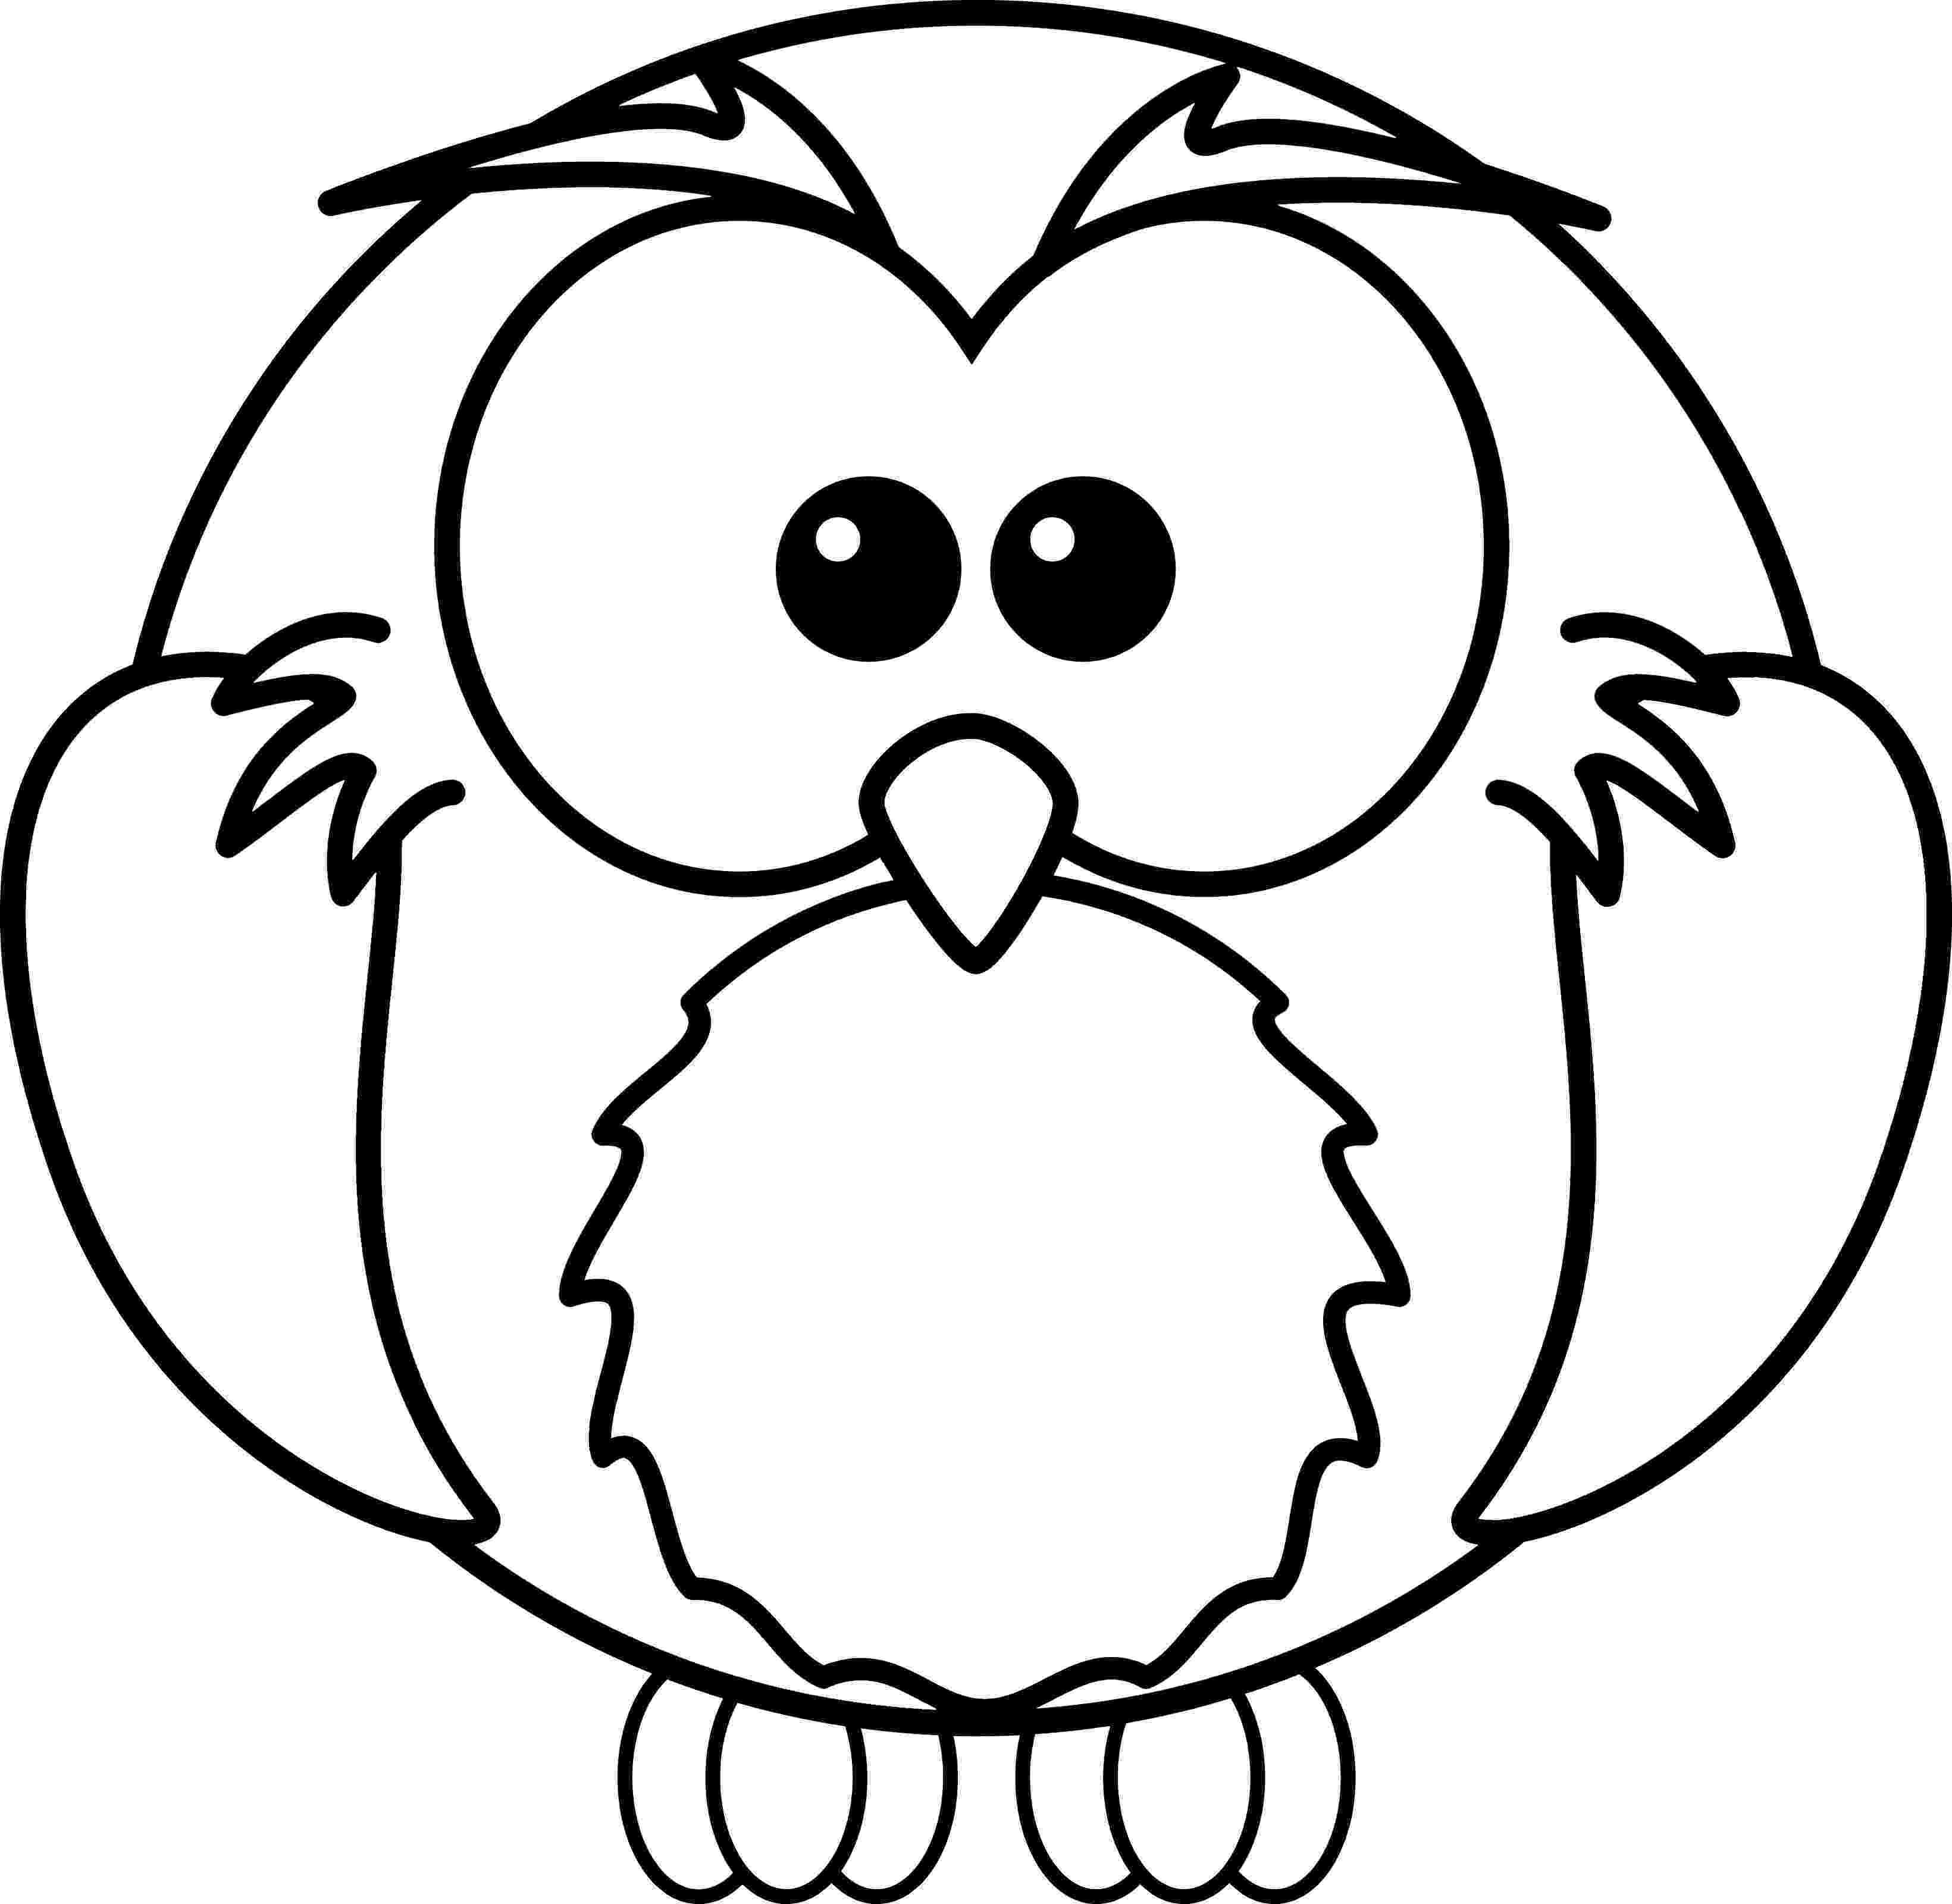 owl cartoon coloring pages cartoon owl coloring pages clipart best cute owl pages owl coloring cartoon